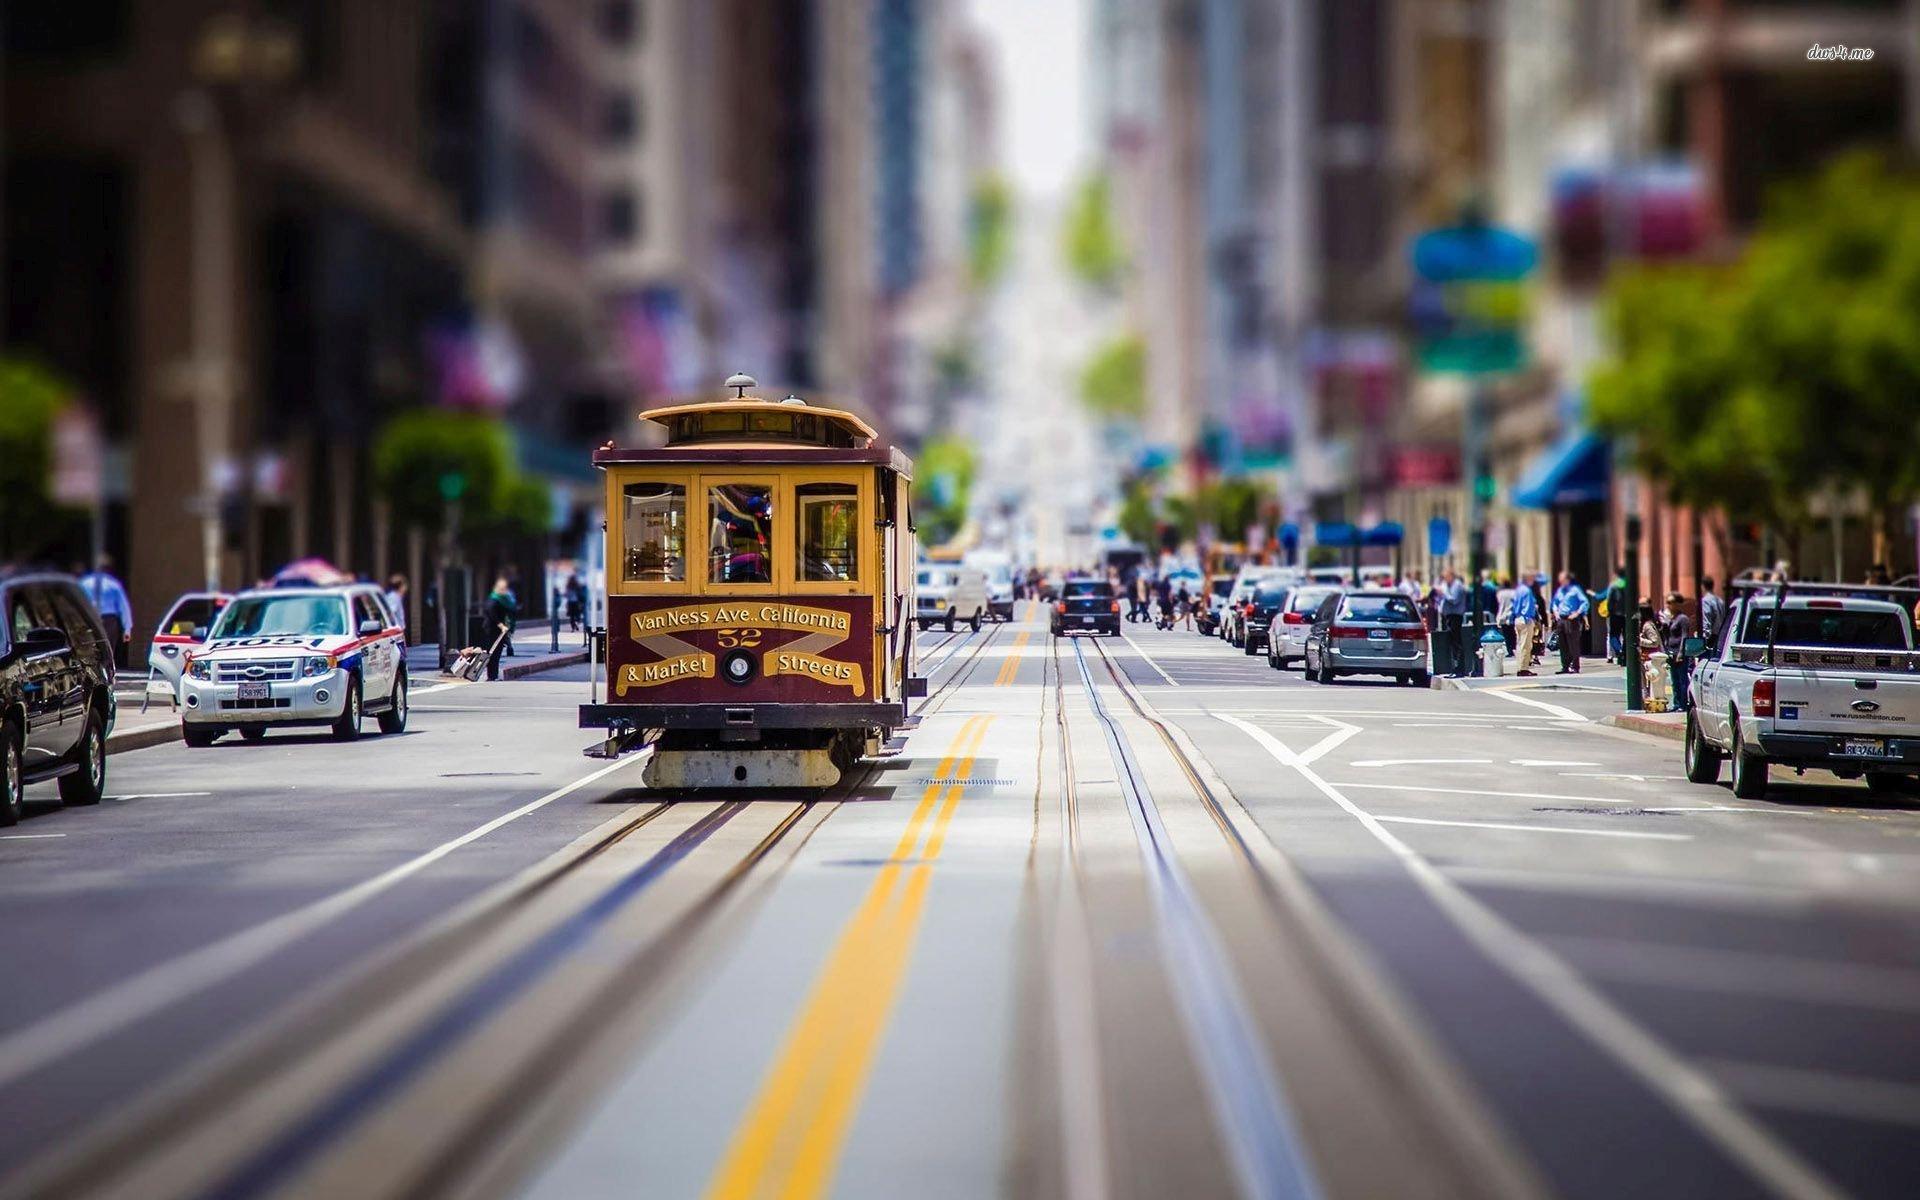 Download Wallpaper Macbook San Francisco - thumb-1920-526819  2018_968077.jpg